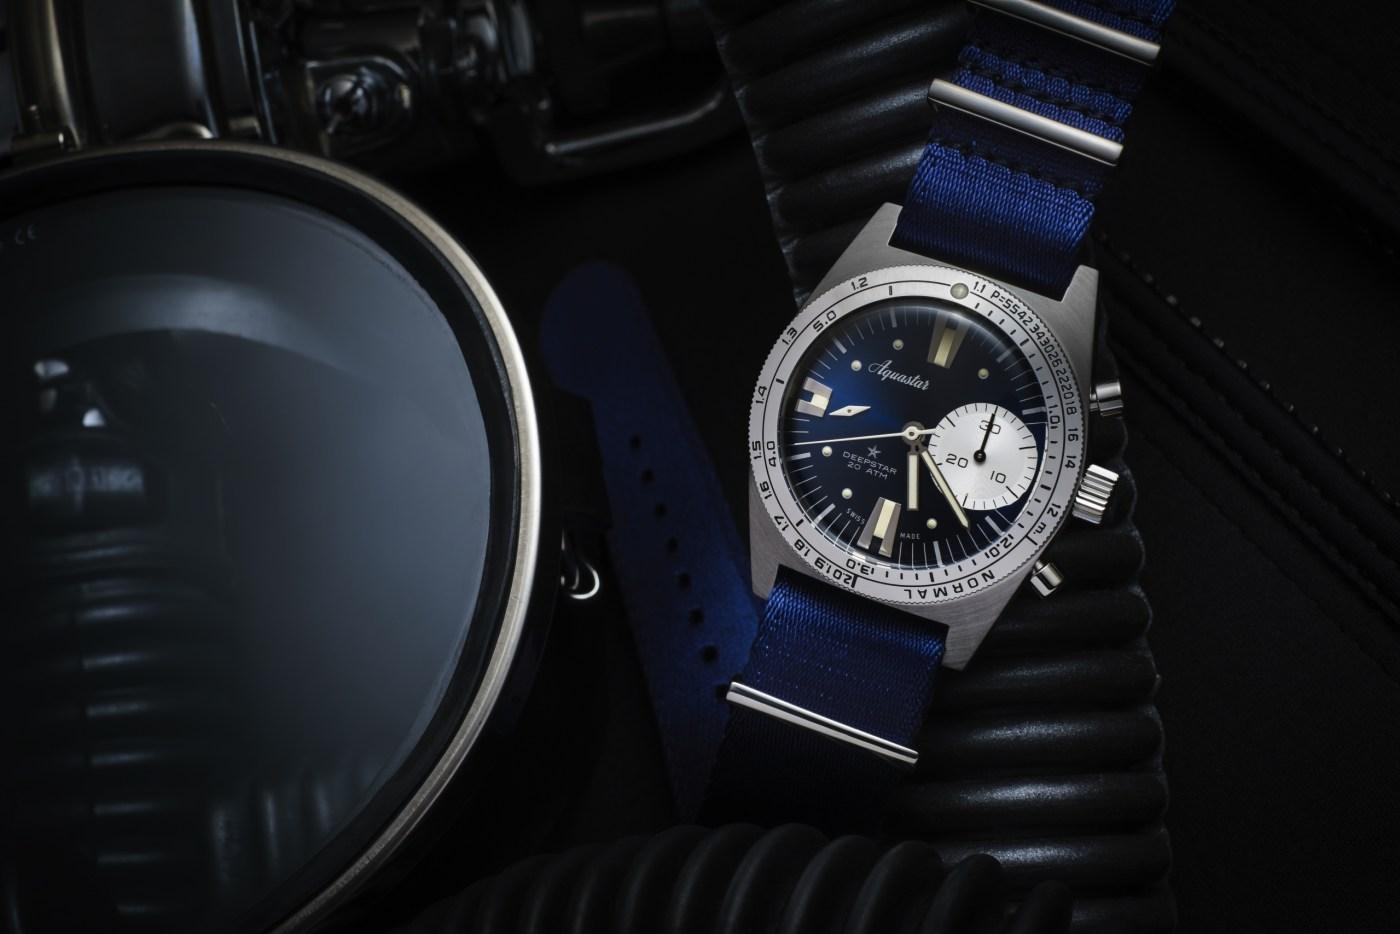 2020 Aquastar Deepstar Chronograph Re-Edition blue dial